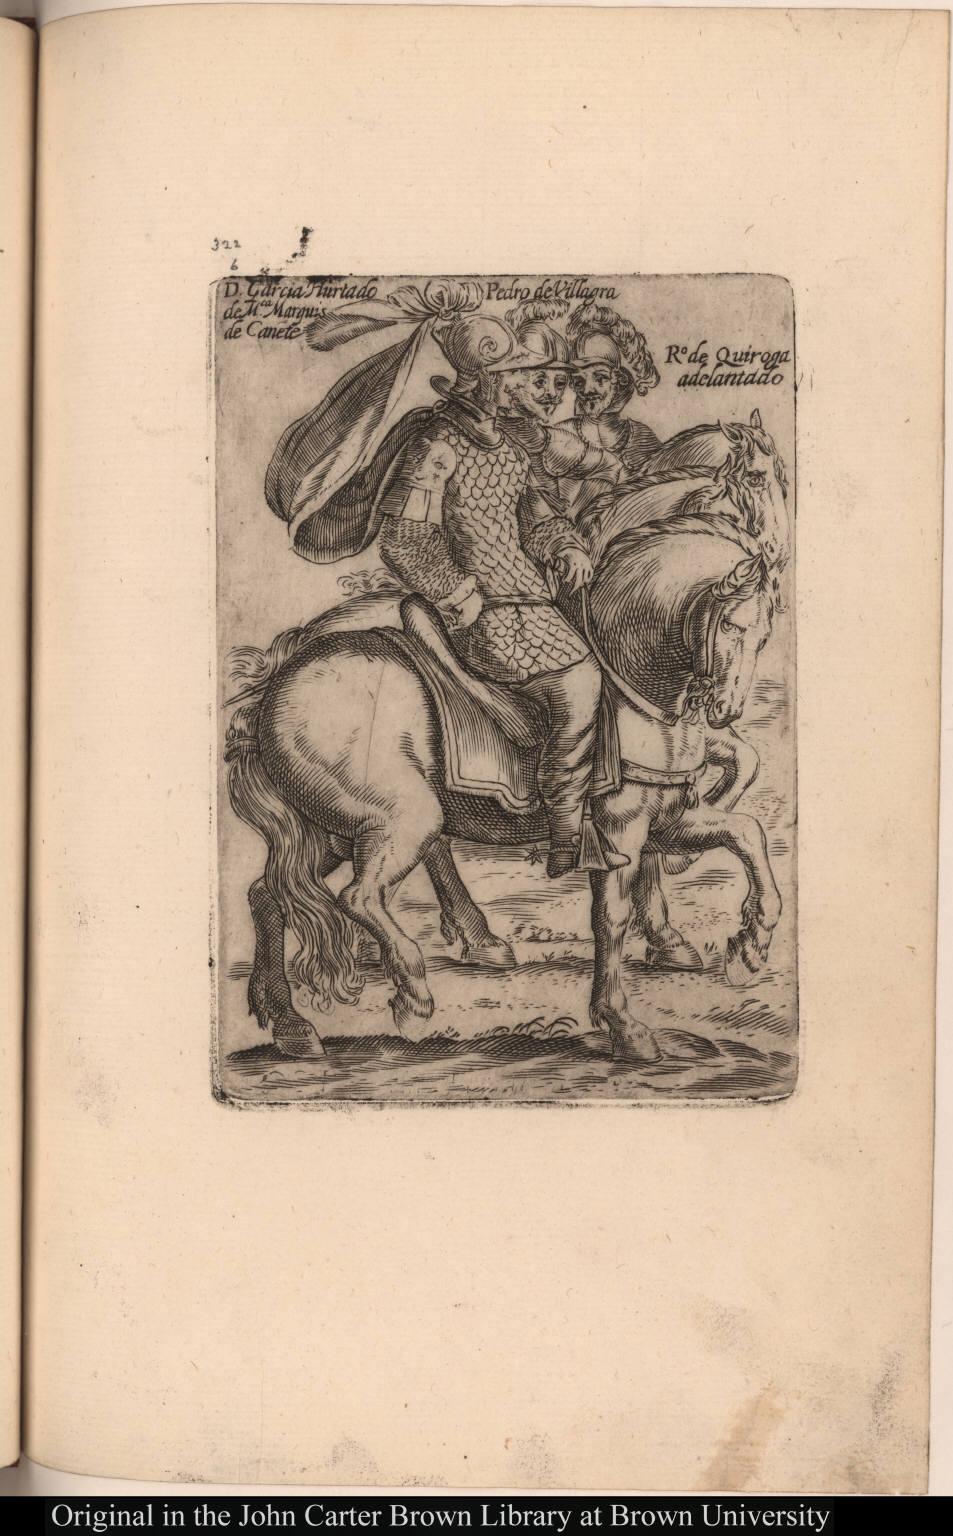 D. Garcia Hurtado de Mca. Marquis de Canete Pedro de Villagra Ro de Quiroga adelantado